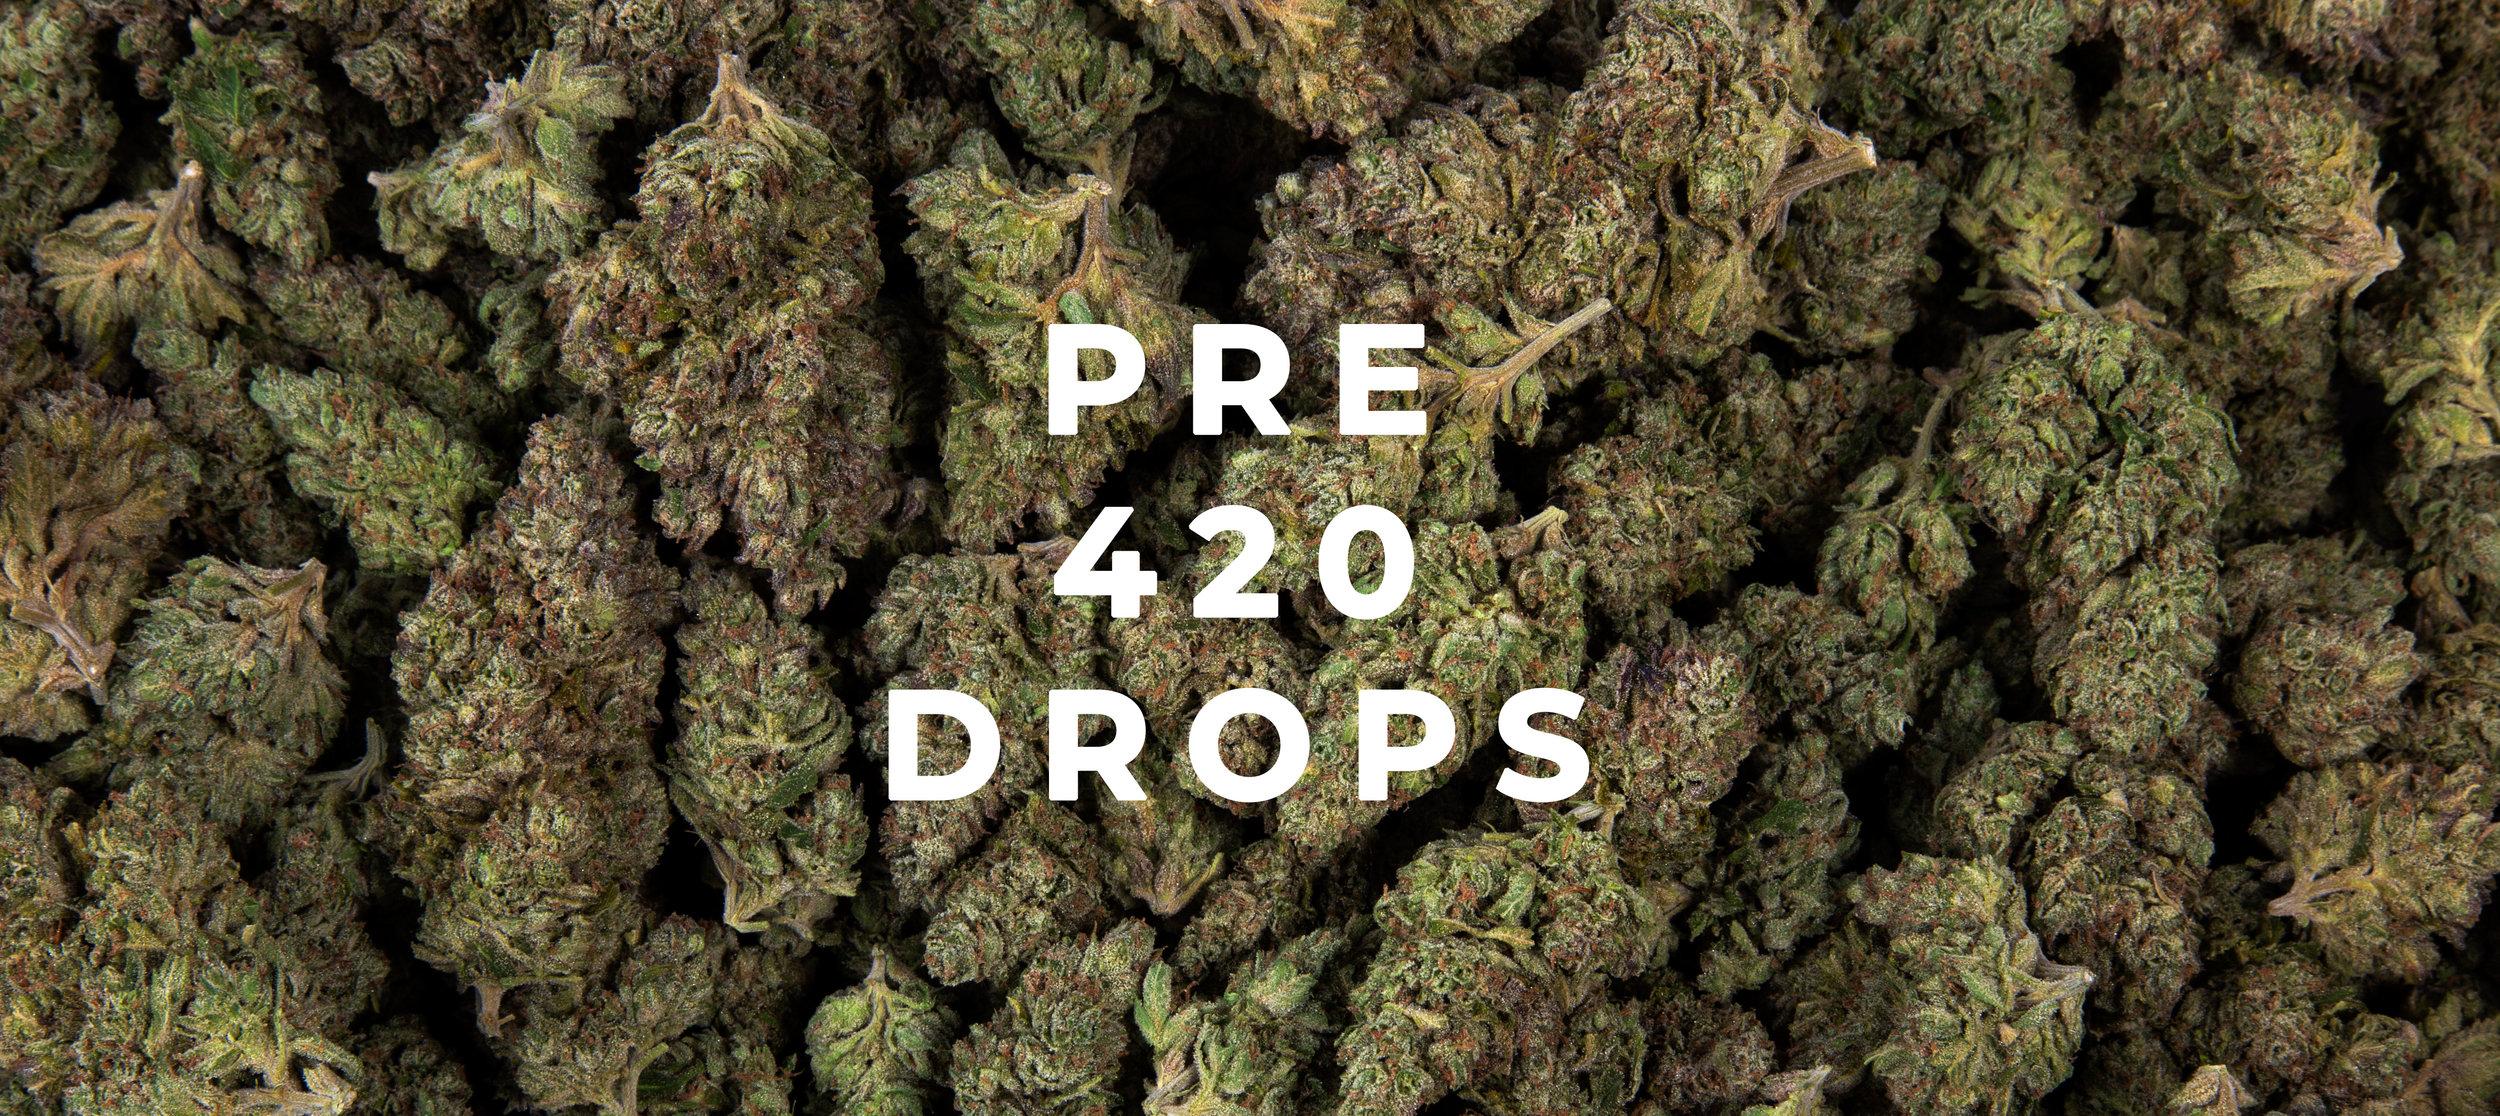 pre-420-drops-F.jpg